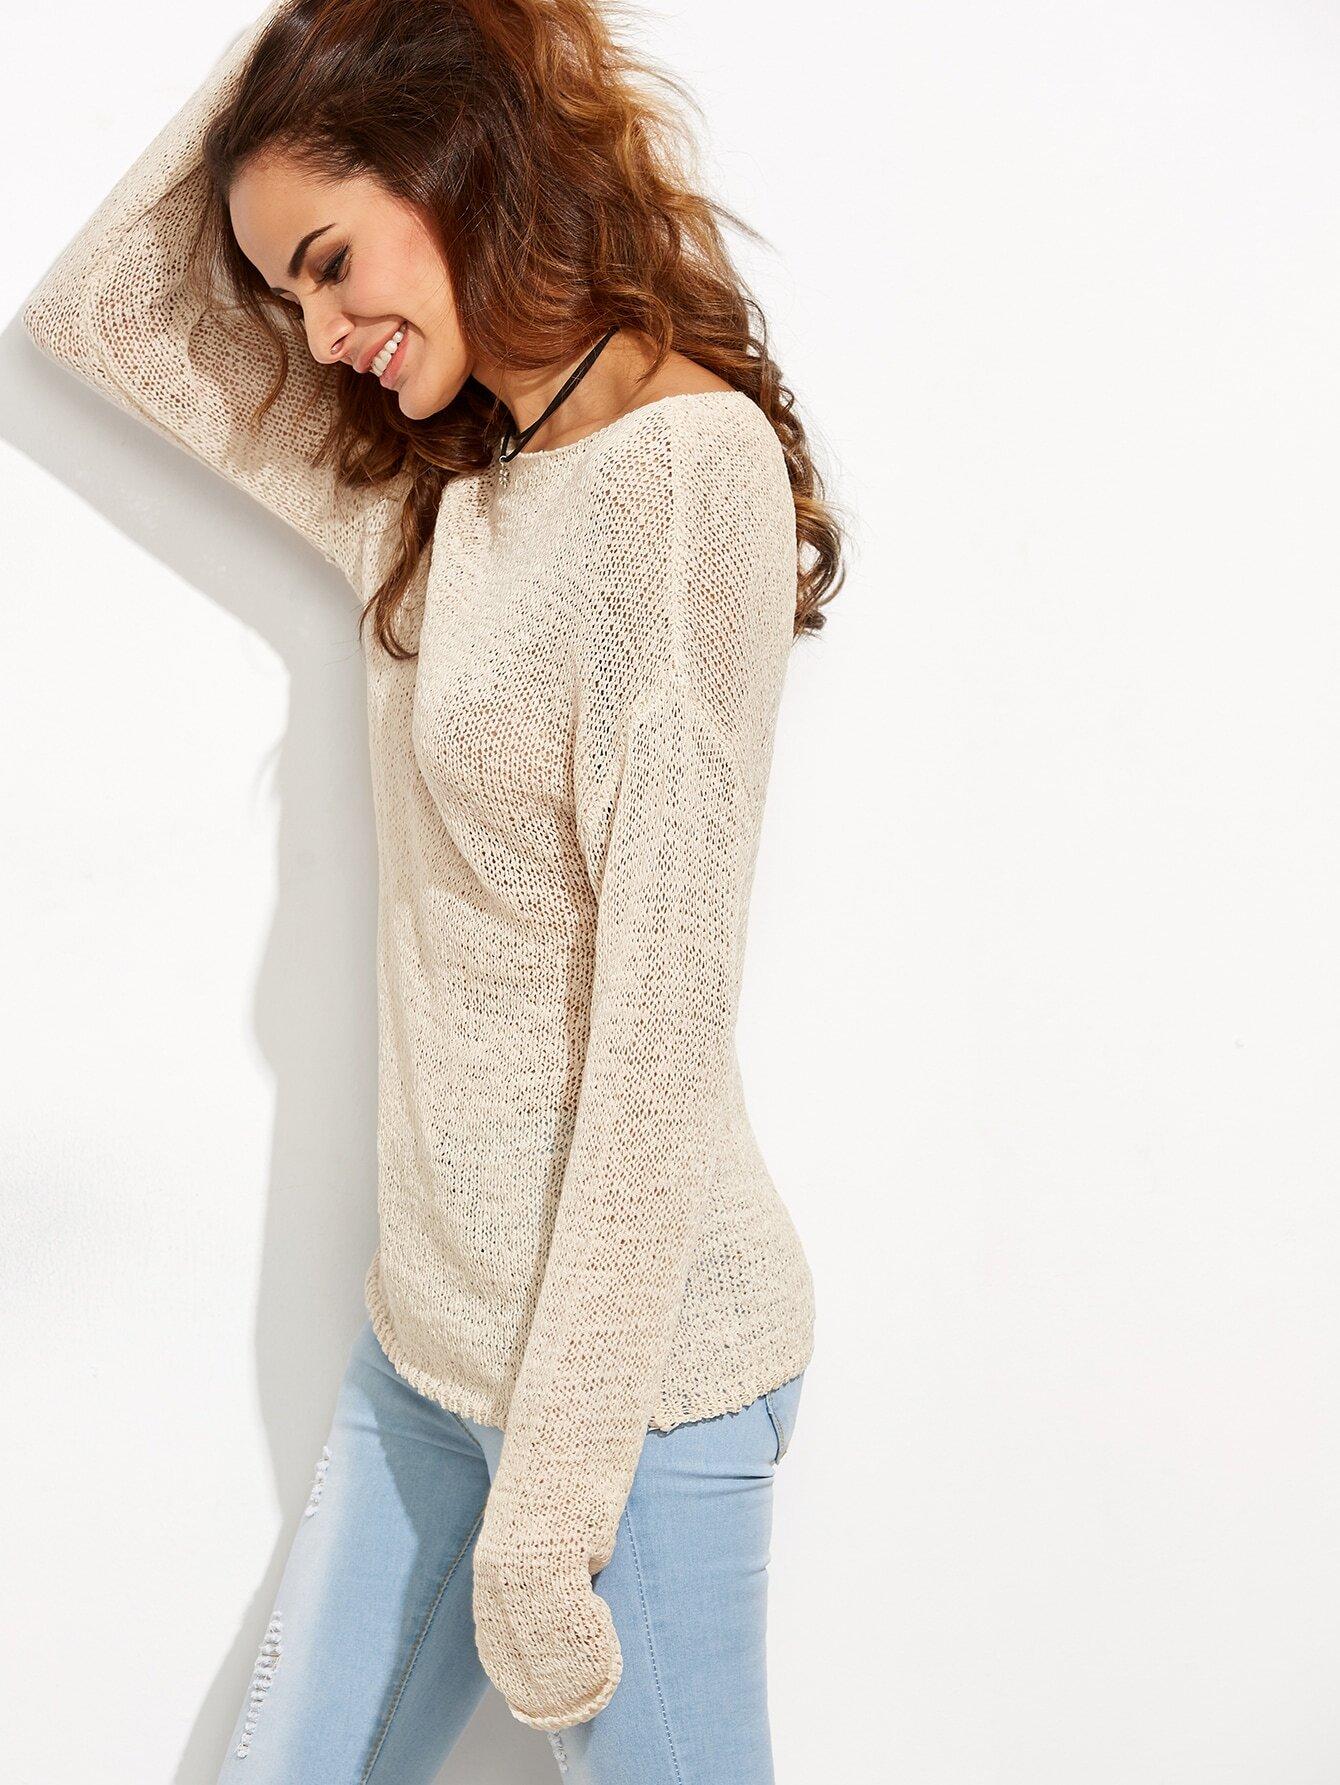 sweater160810703_2